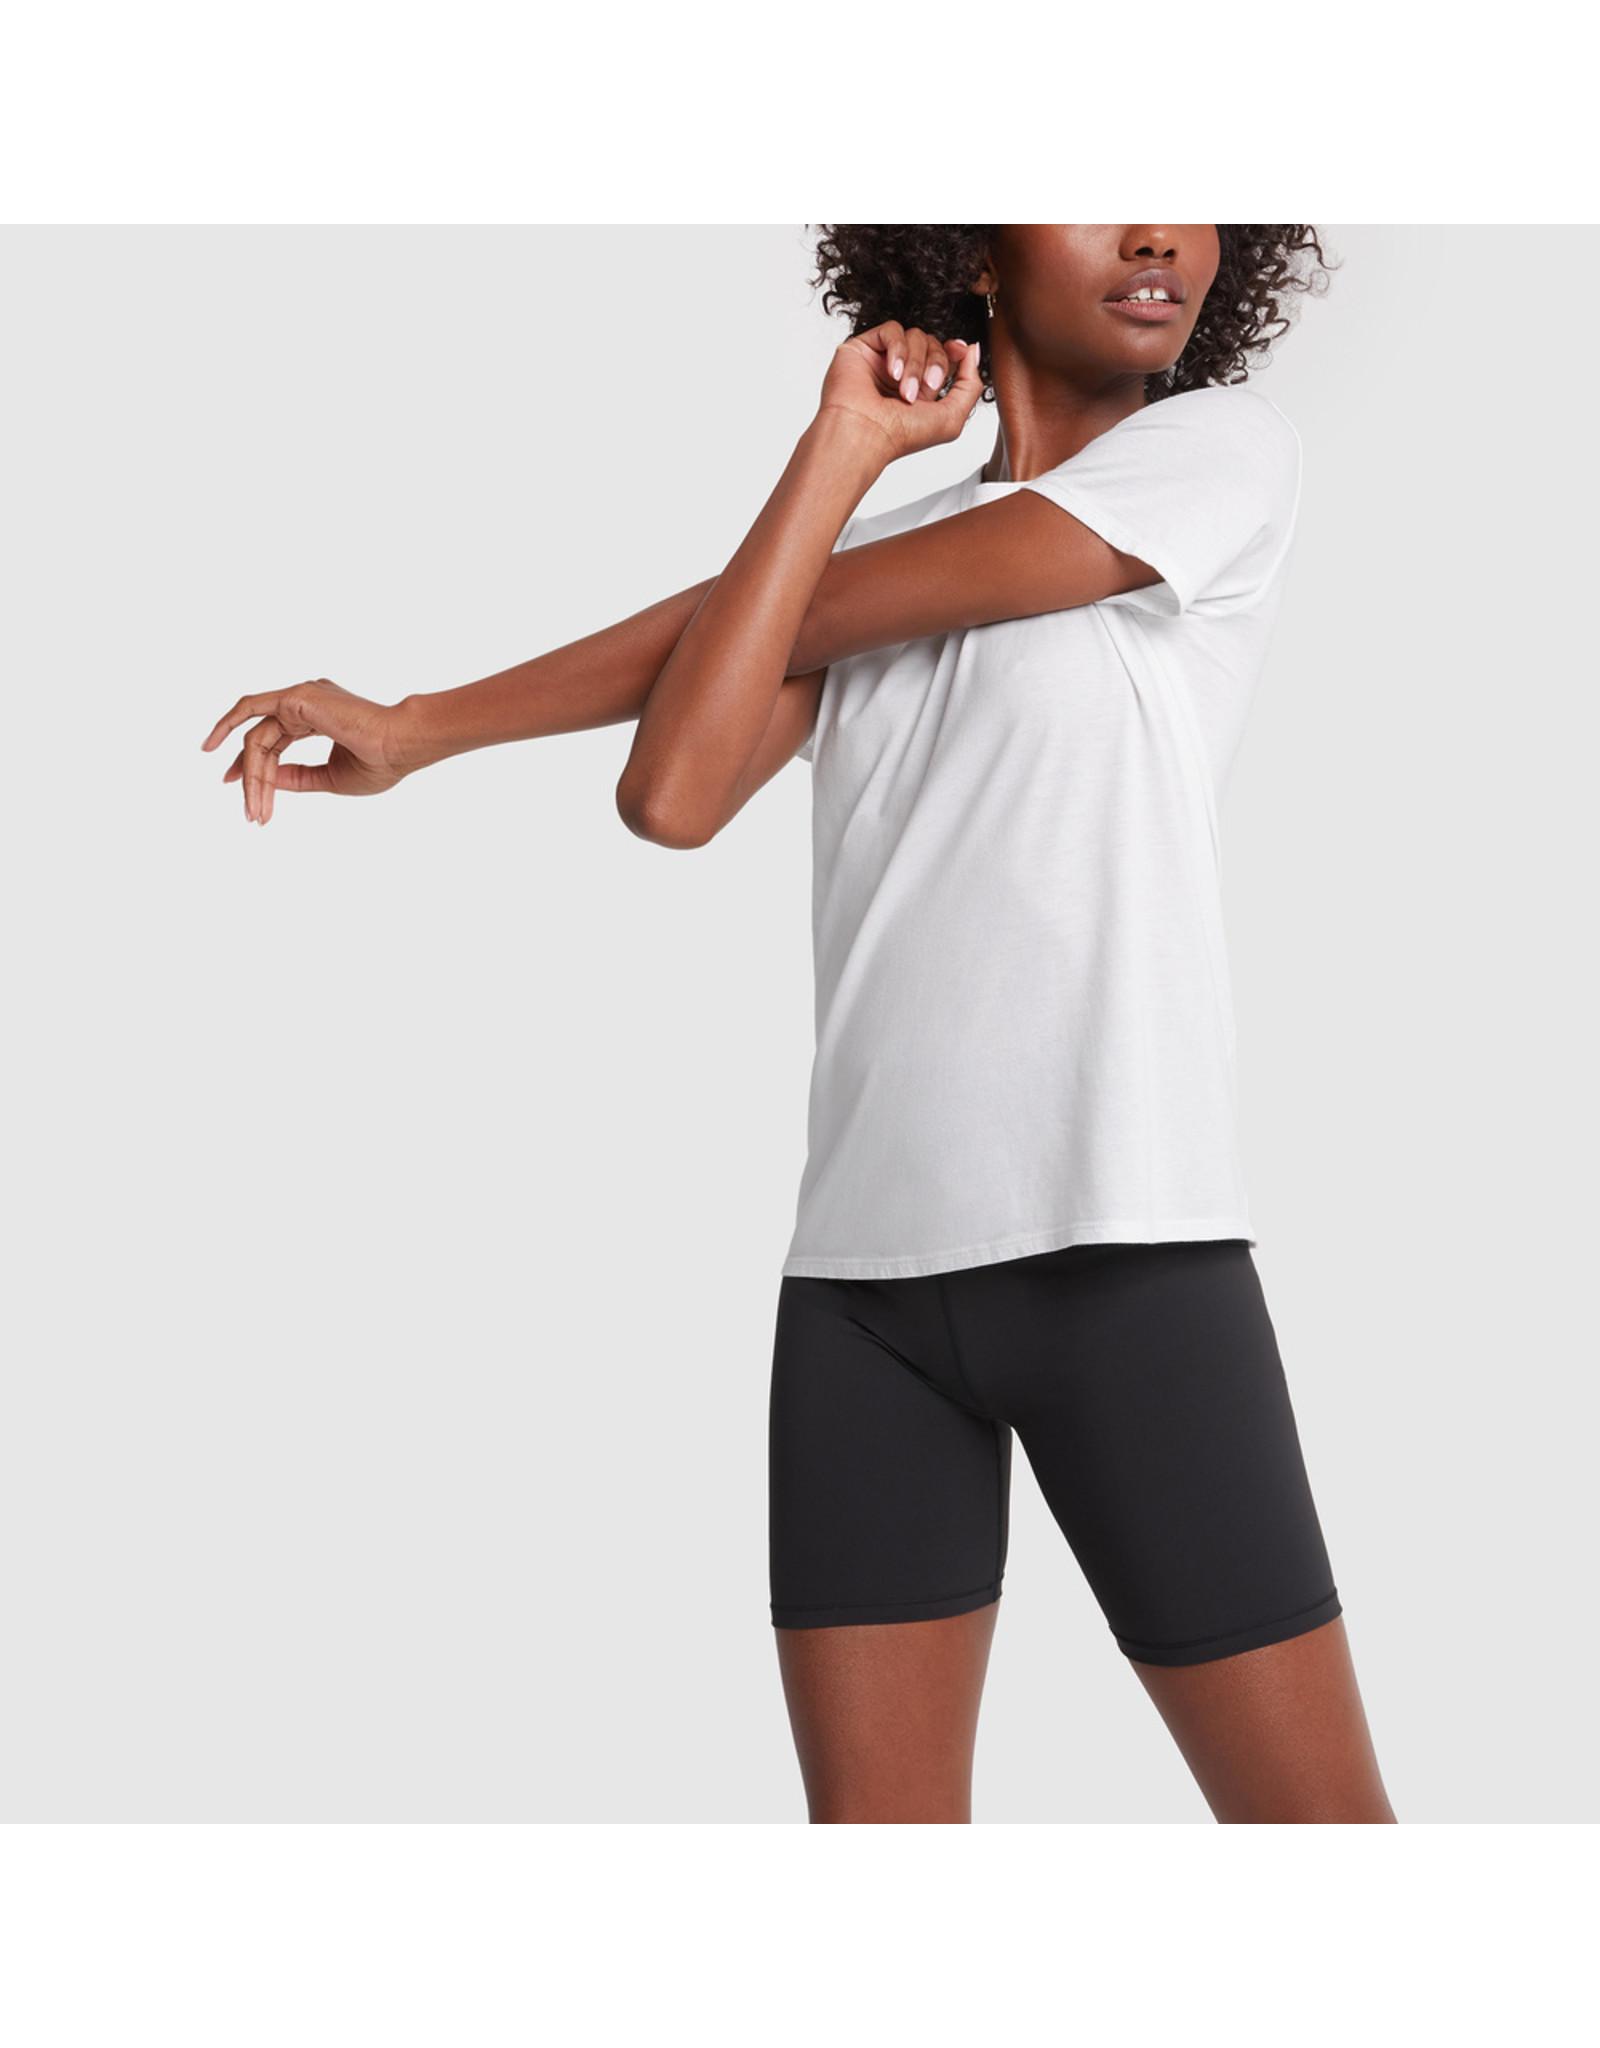 G. Sport x Proenza Schouler G. Sport x Proenza SchoulerLifestyle T-Shirt (Color: White, Size: XL)